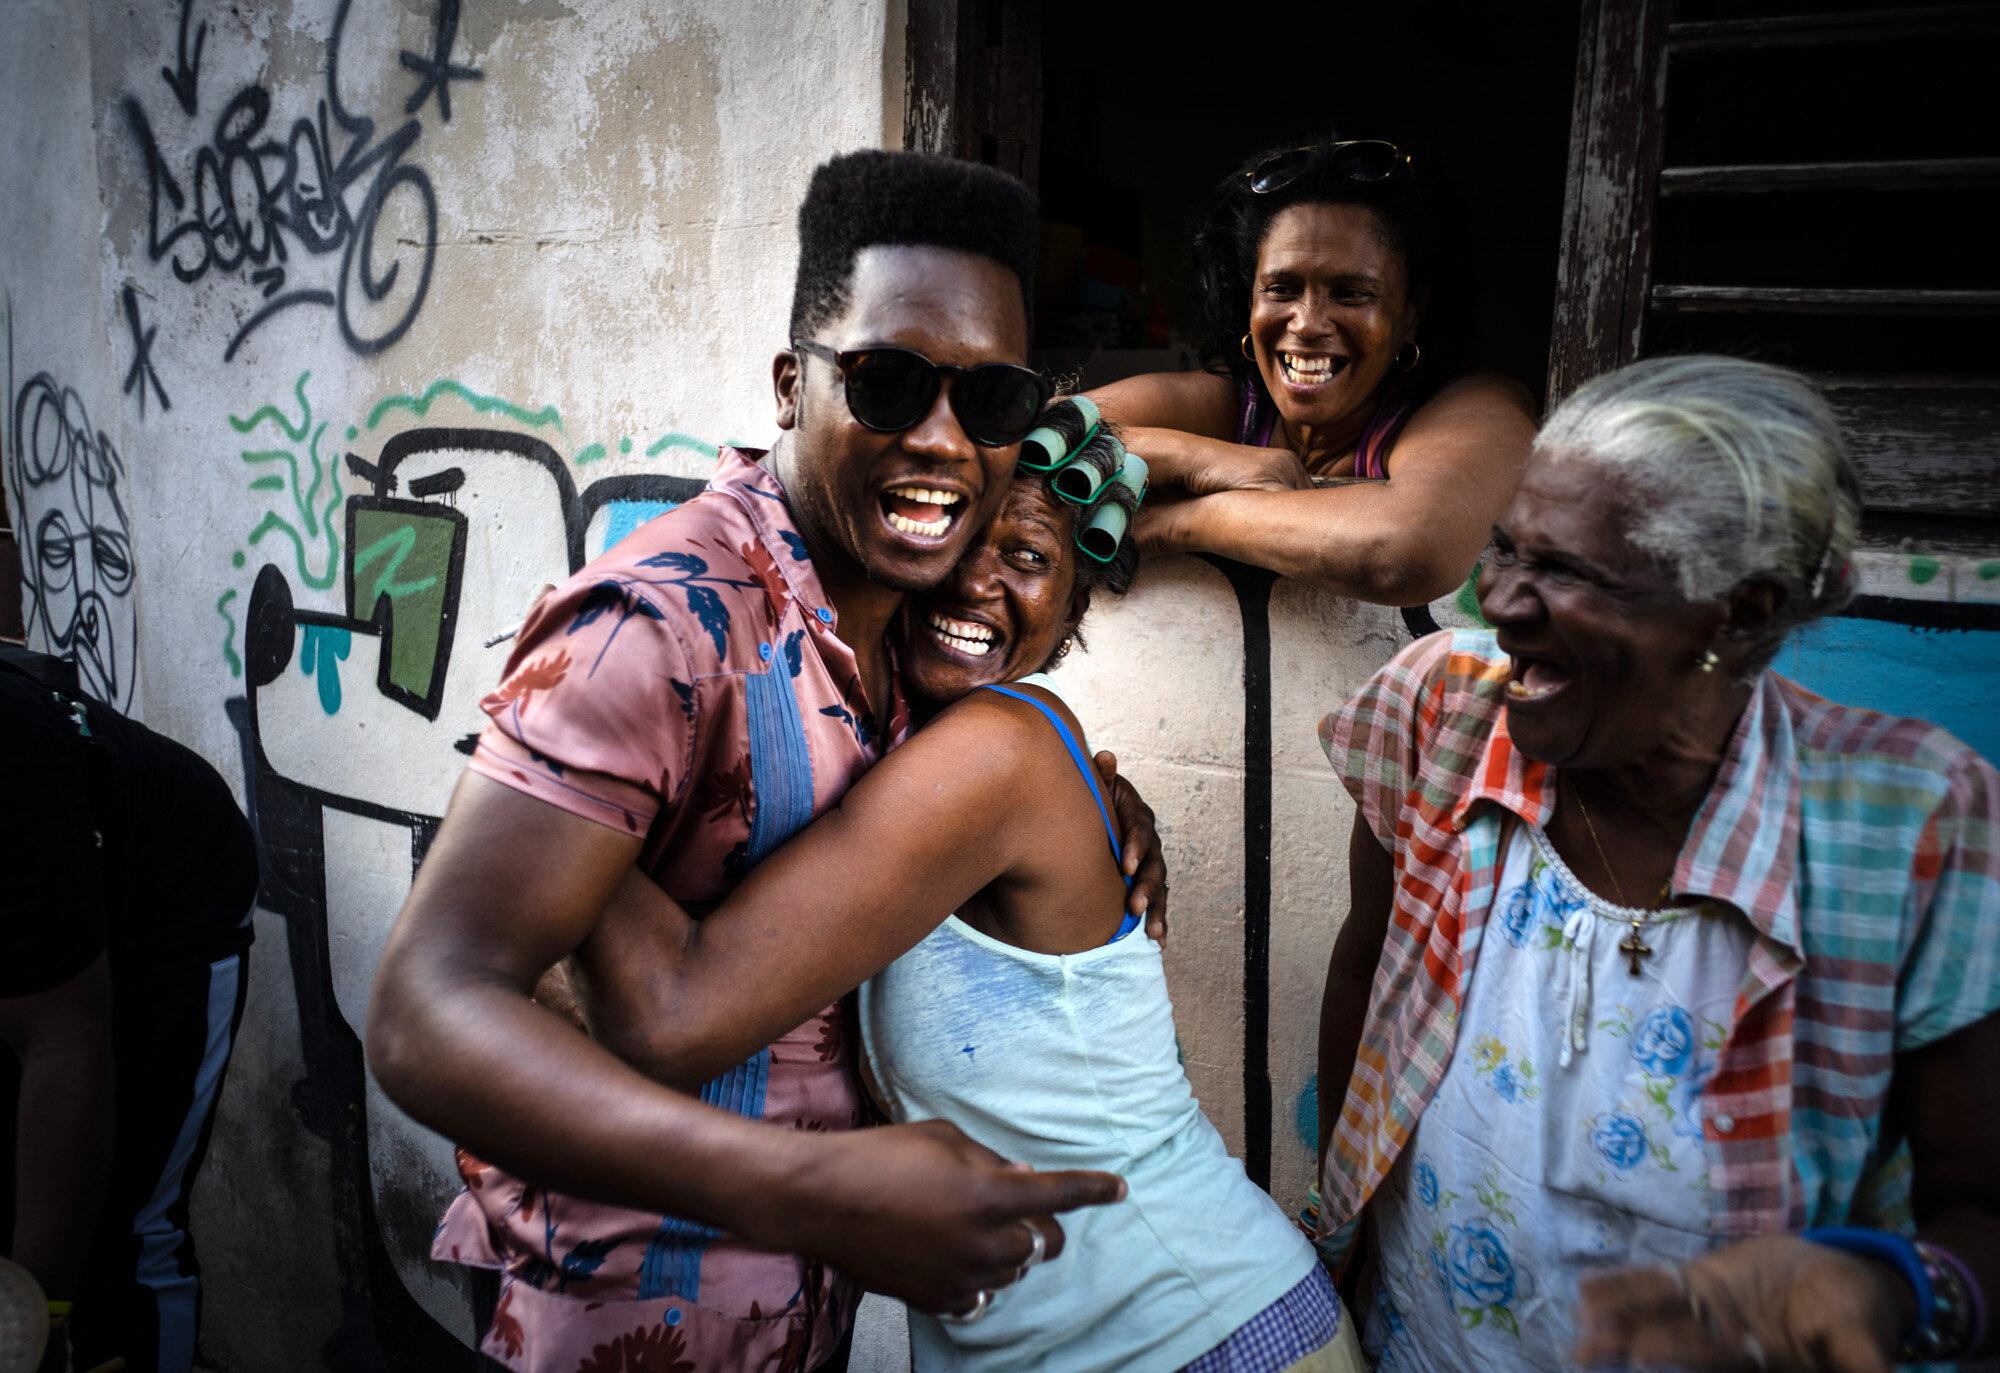 Cuban singer Cimafunk hugs a woman during a music conga through the streets of Cuba's Old Havana neighborhood during the 35th Havana International Jazz Festival on Jan. 15, 2020. (AP Photo/Ramon Espinosa)